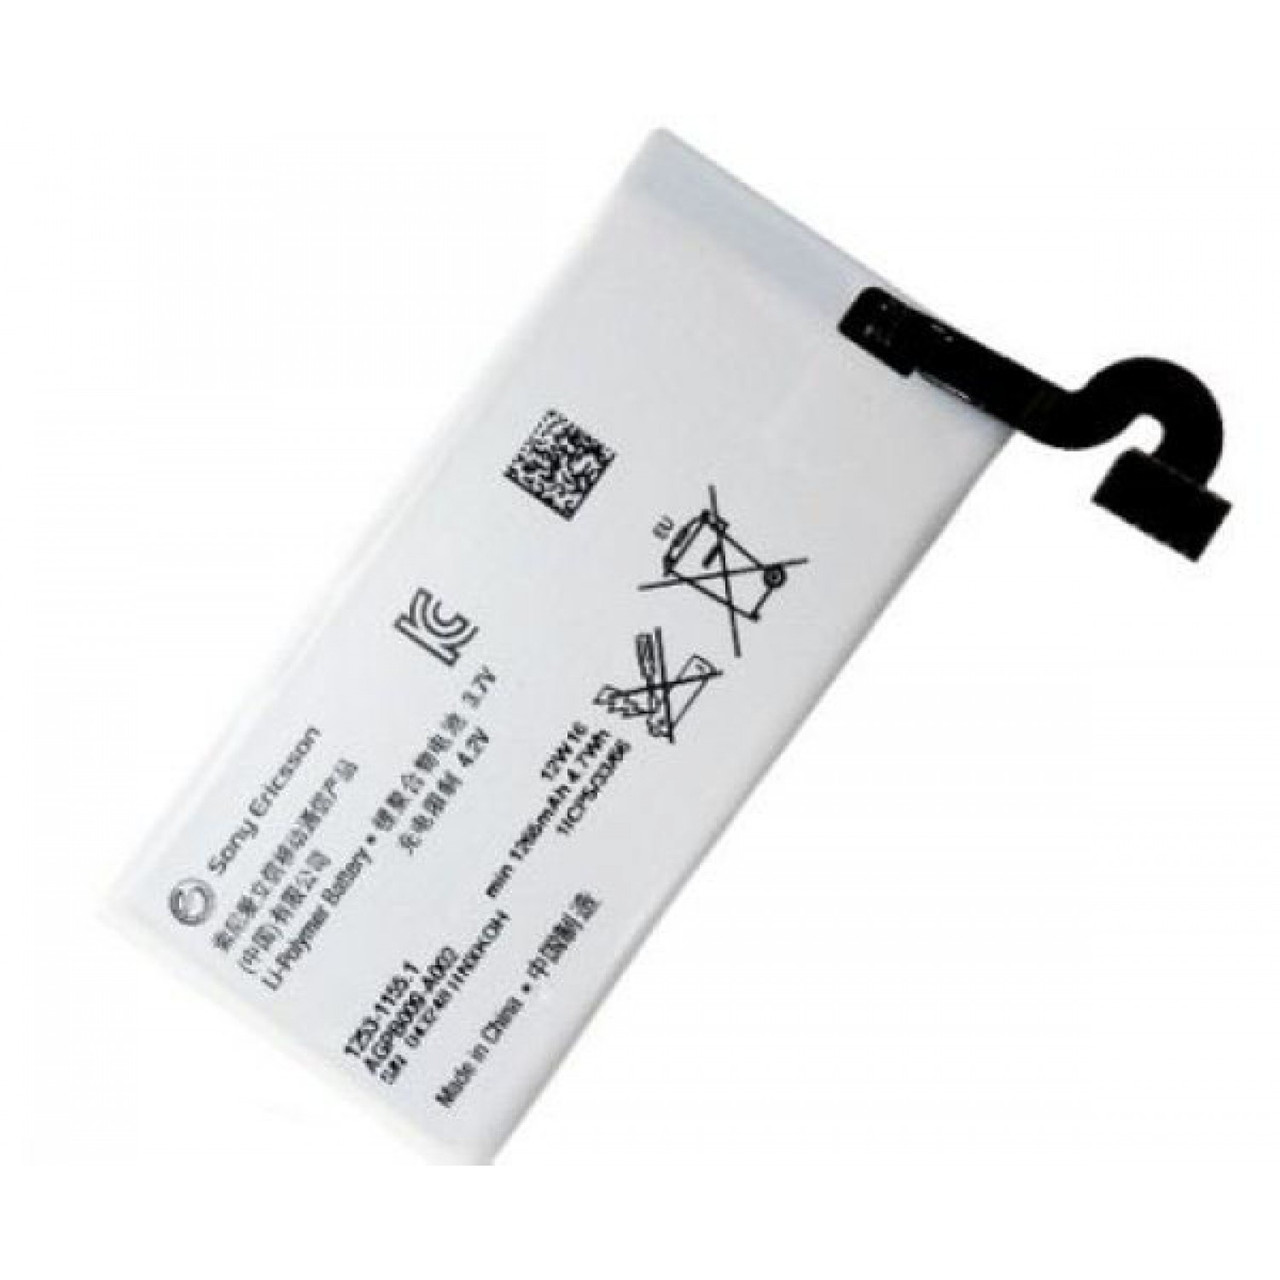 Аккумулятор батарея Sony AGPB009-A002, MT27i Xperia Sola